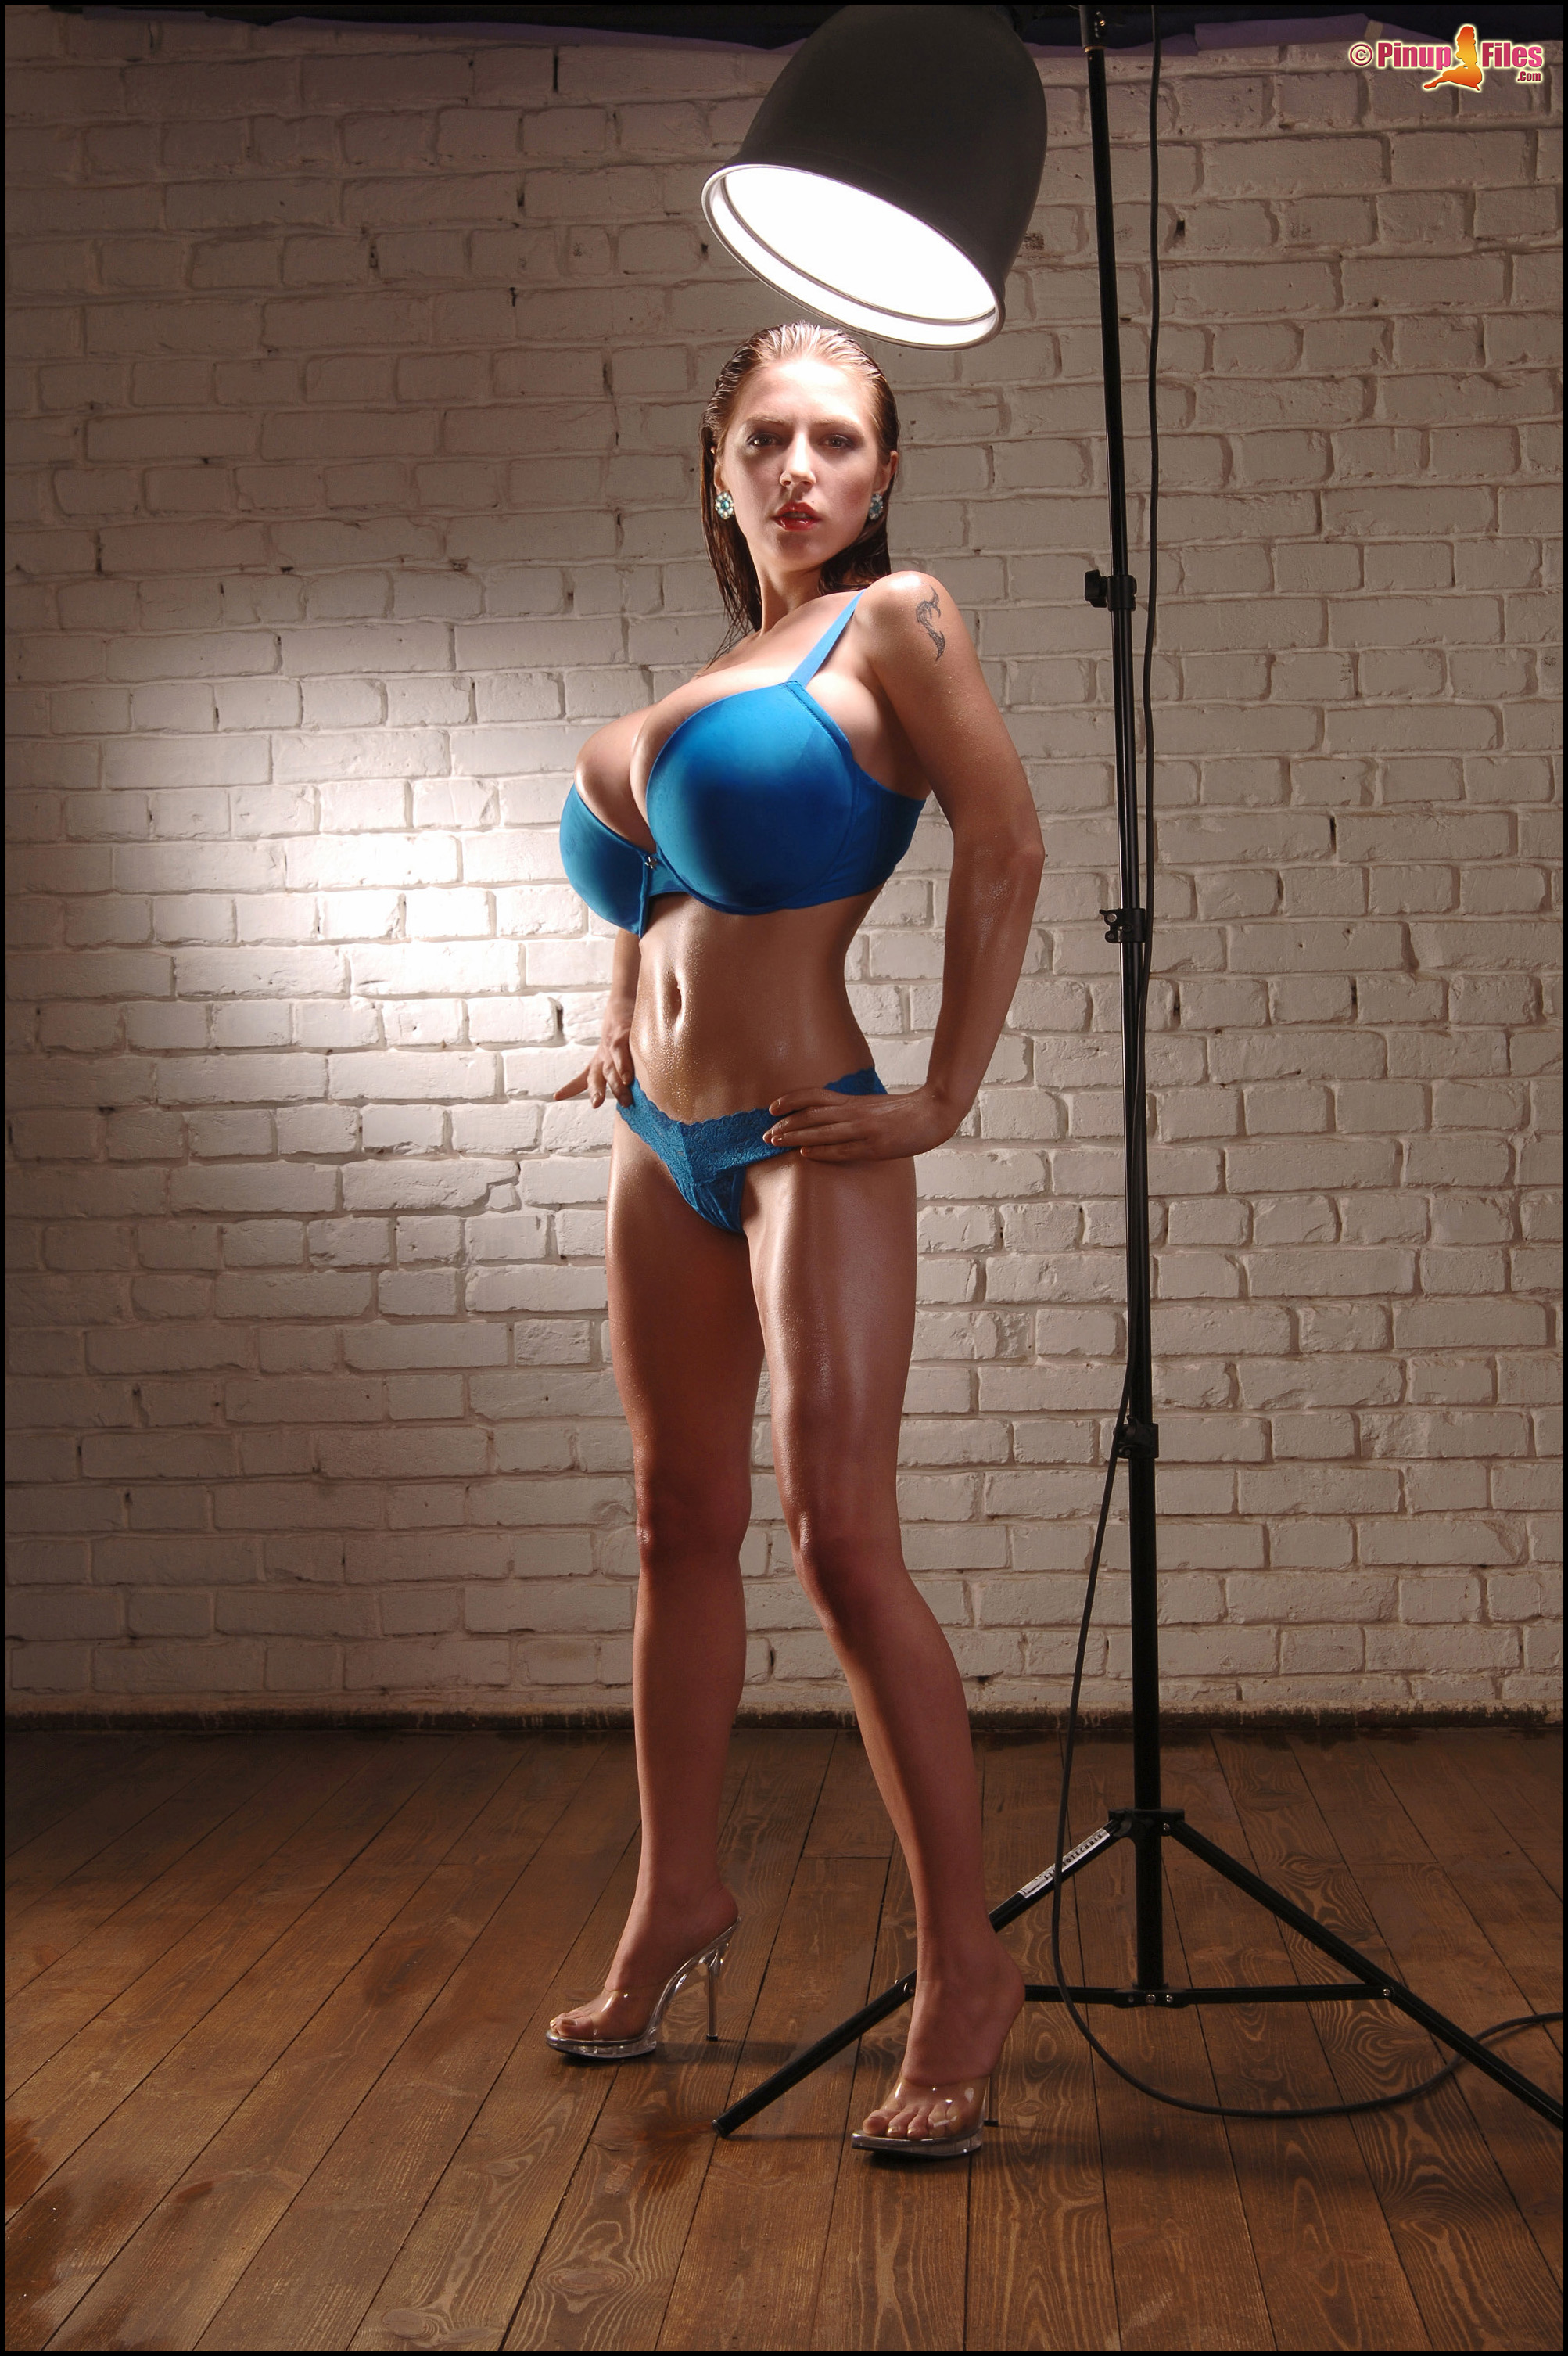 http://promo.pinupfiles.com/FHG/anyazenkova-vol10-set01/02.jpg